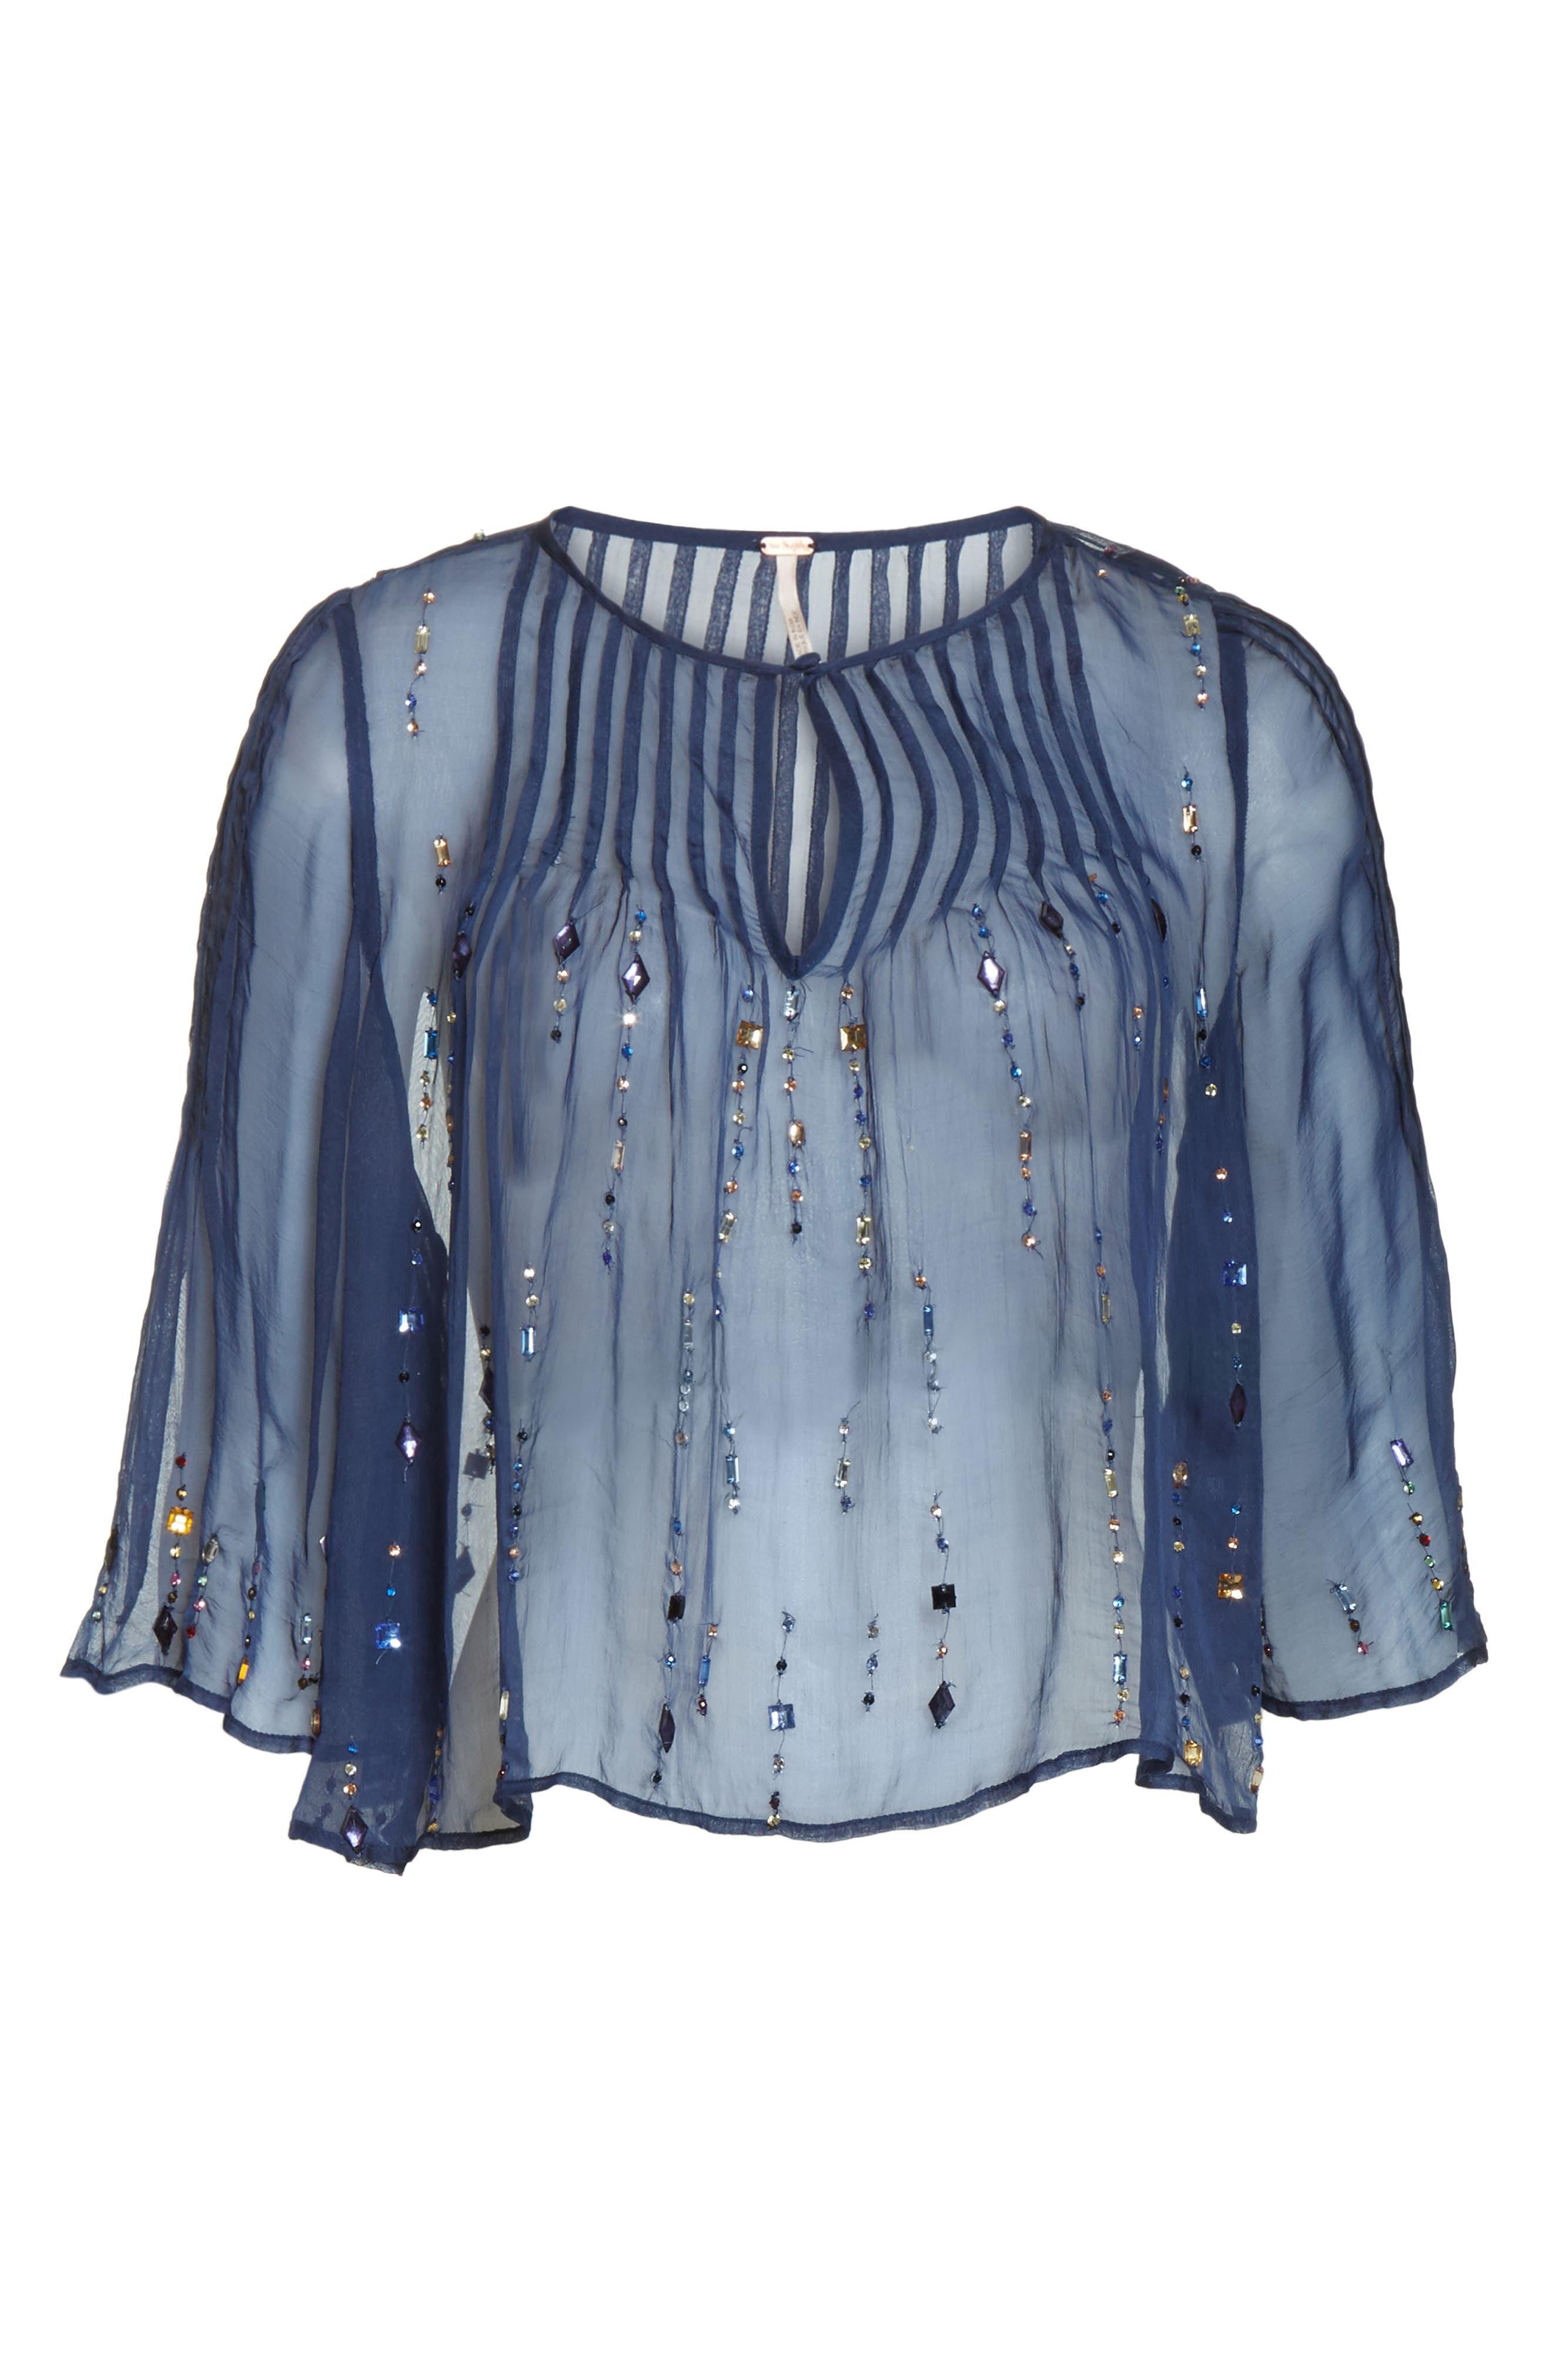 Jewel Box Embellished Sheer Top,                             Alternate thumbnail 6, color,                             Sapphire